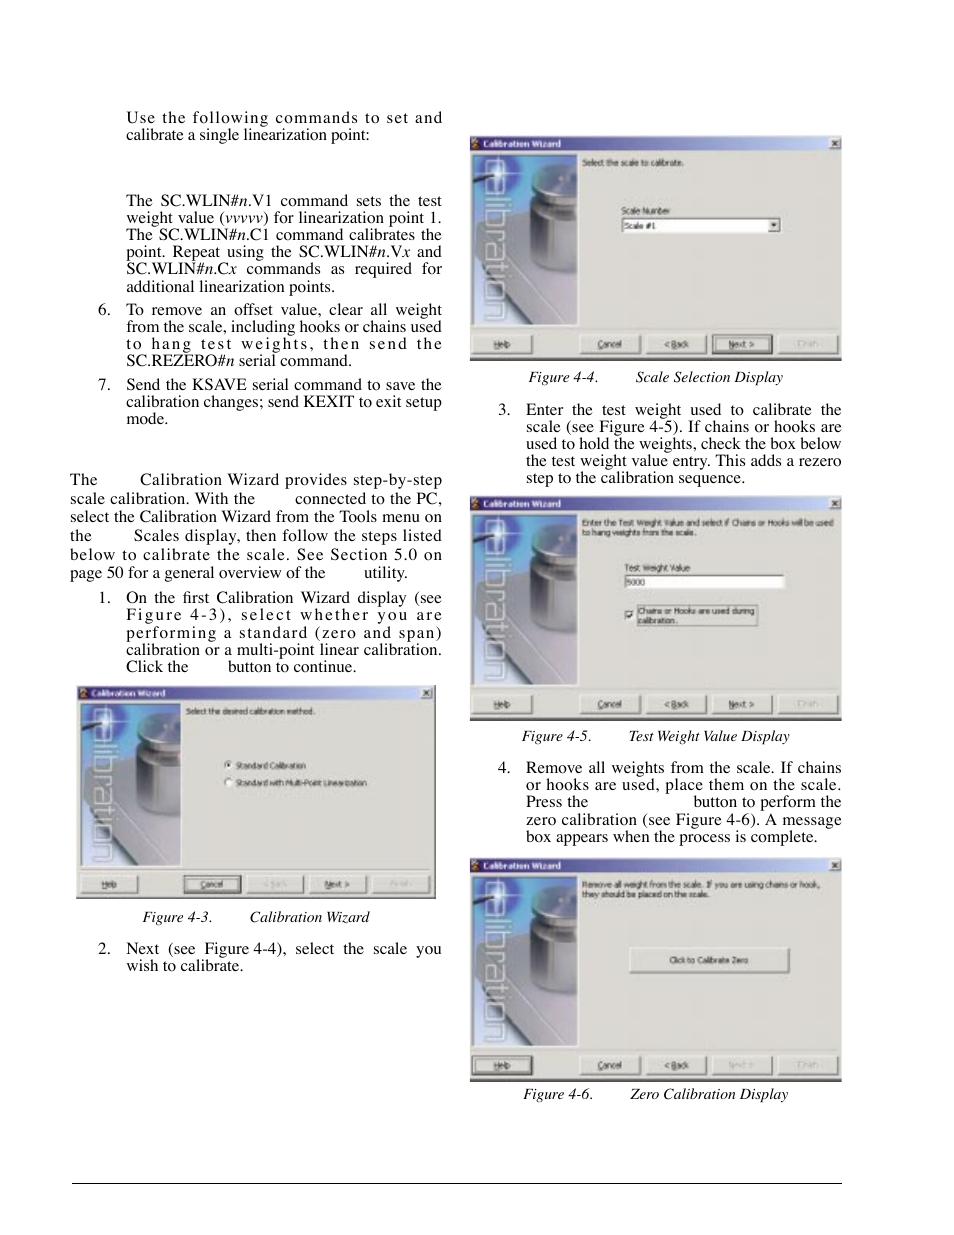 Princeton Vl193 Manual Battery Diagram 1gif 528 Kb 267 Views Array Wizard 4 Rh Spirulinas De